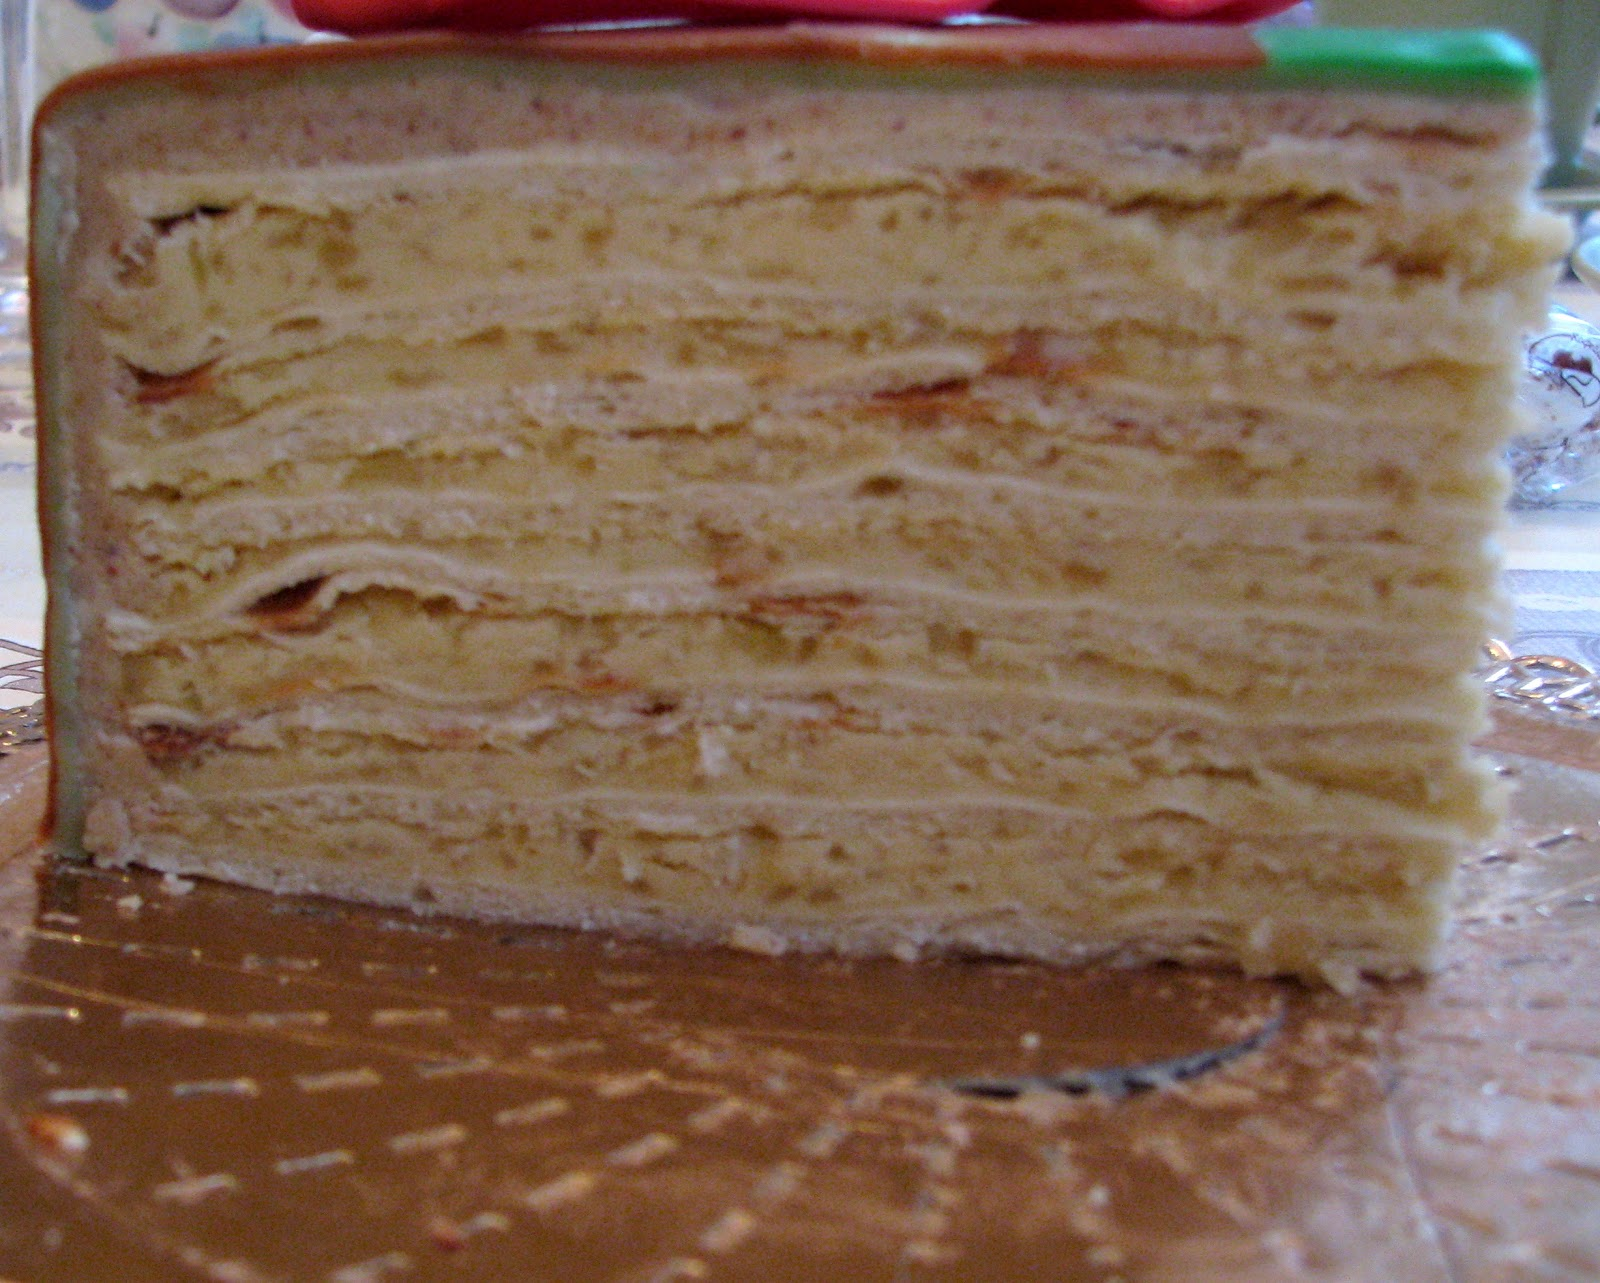 Крем для прослойки торта рецепт пошагово в домашних условиях